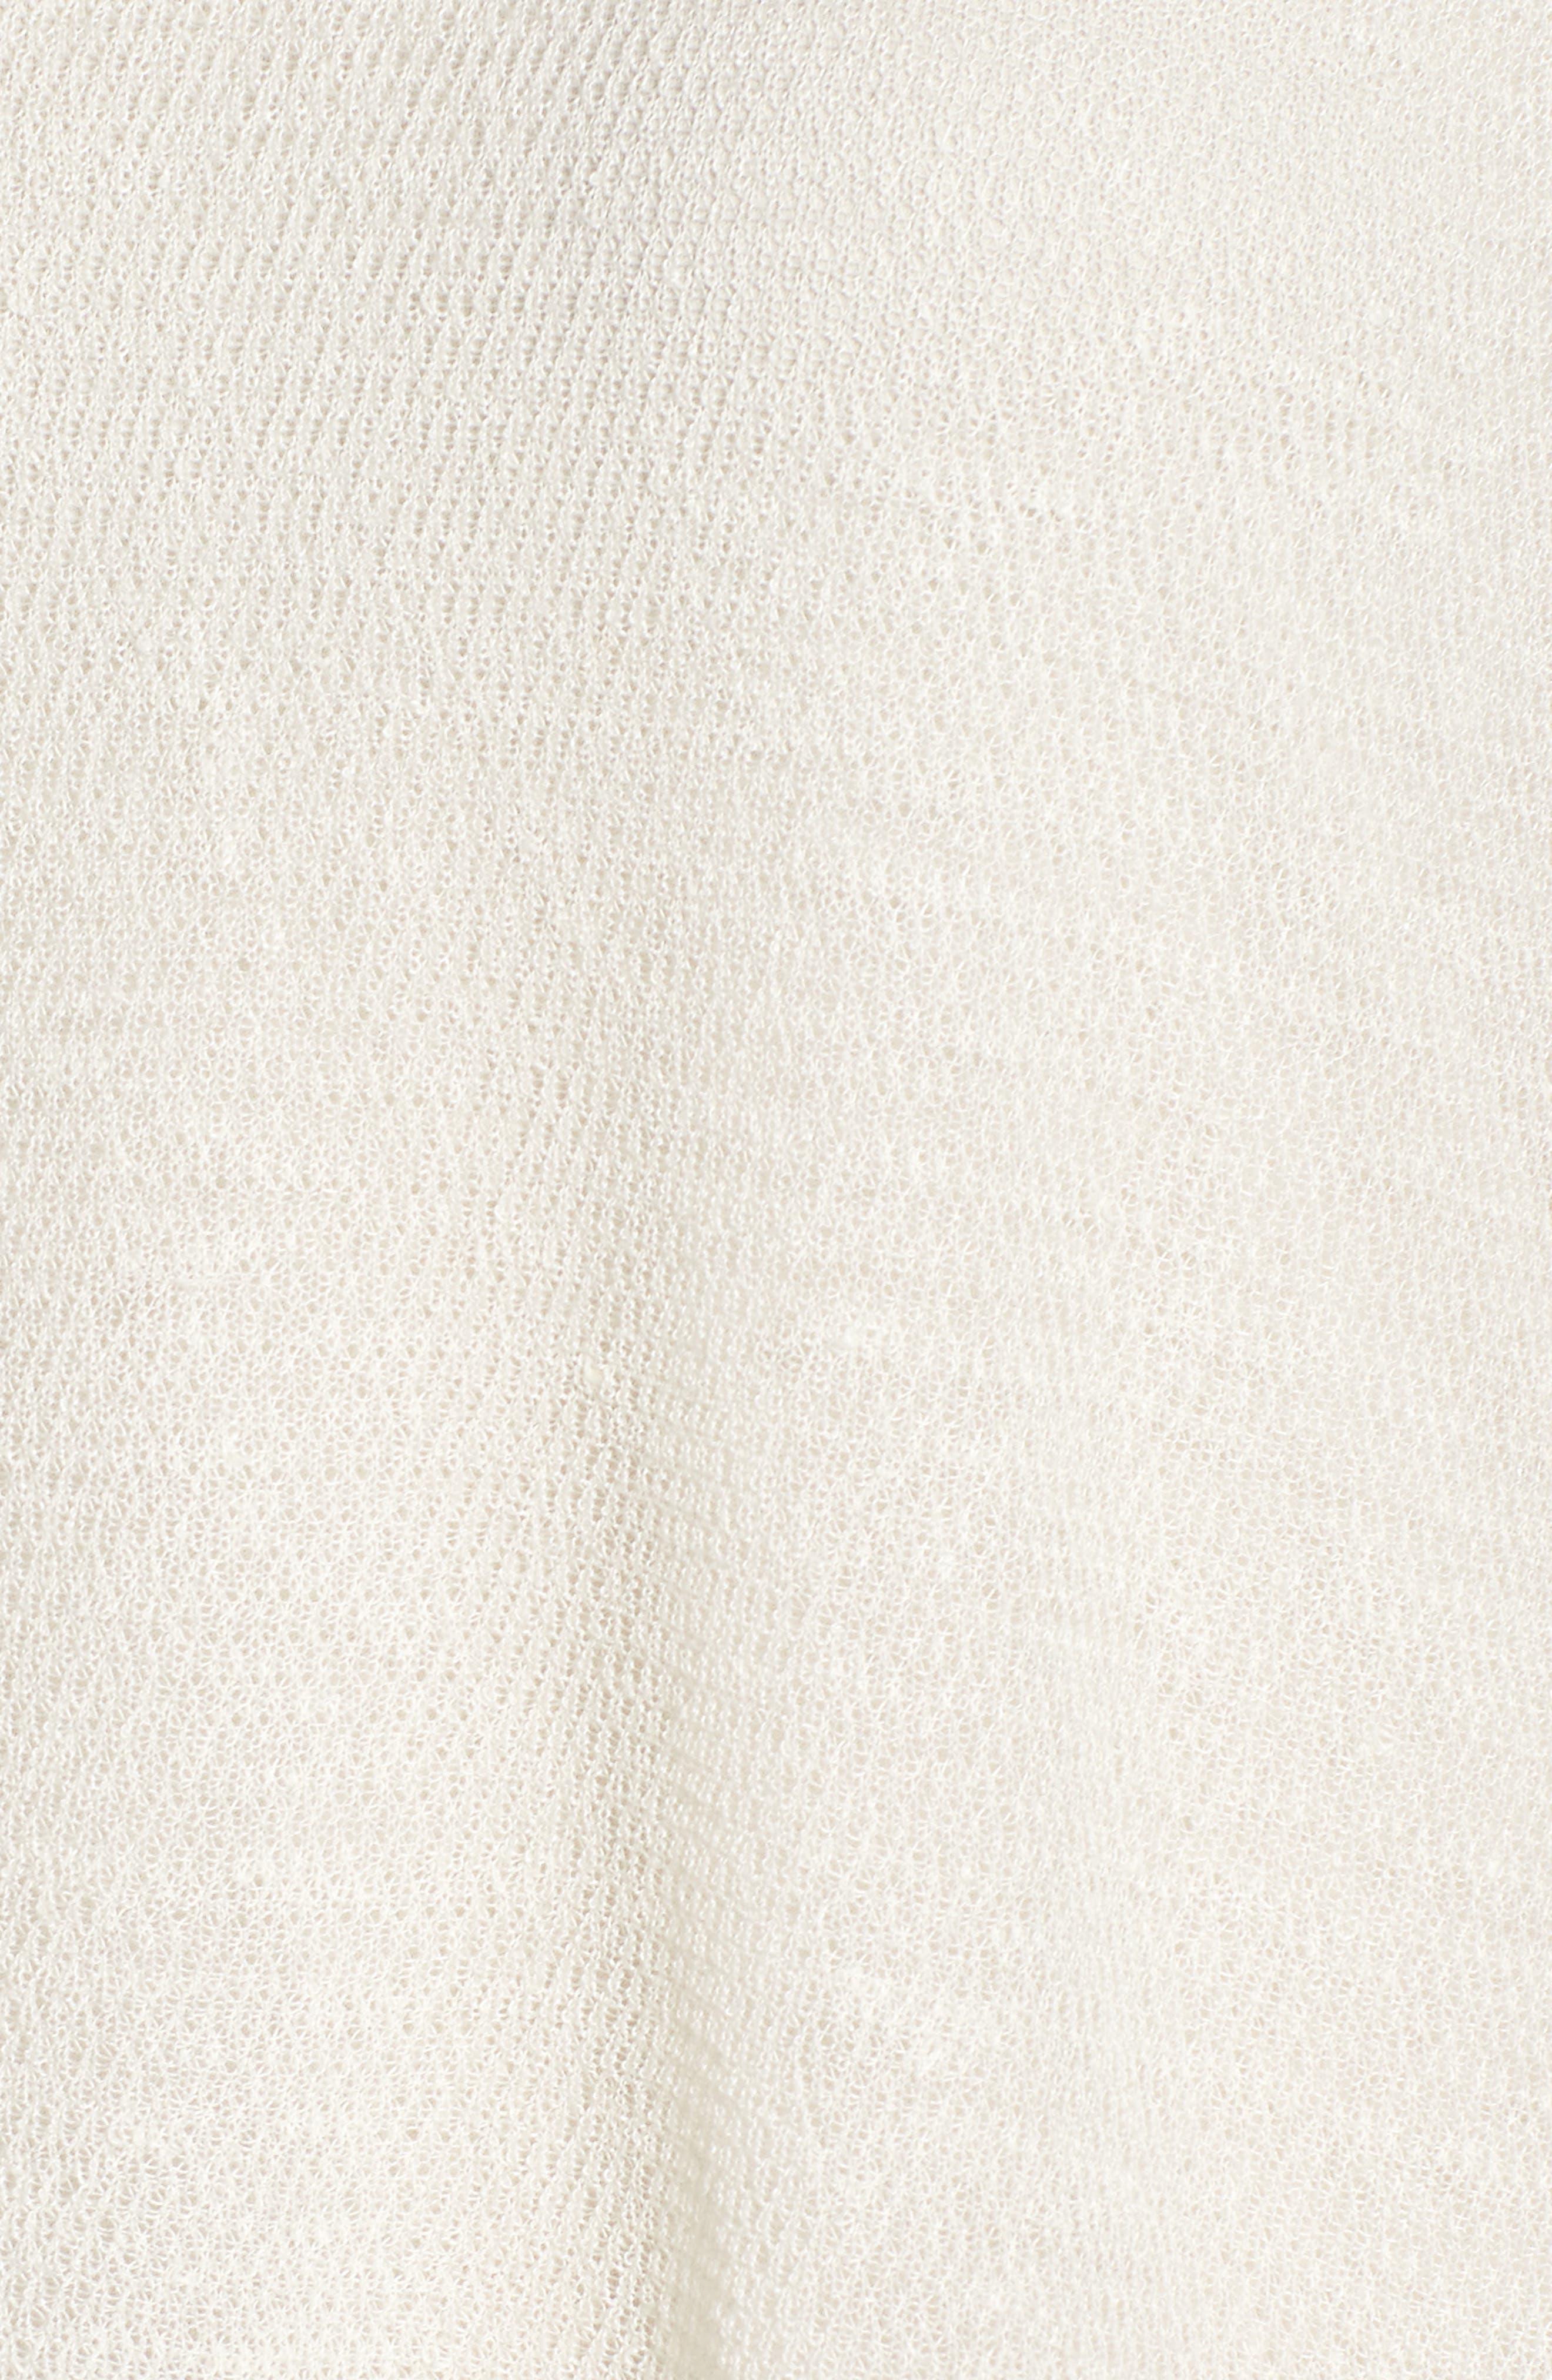 Sheer Asymmetrical Cap Sleeve Sweater,                             Alternate thumbnail 5, color,                             Bone